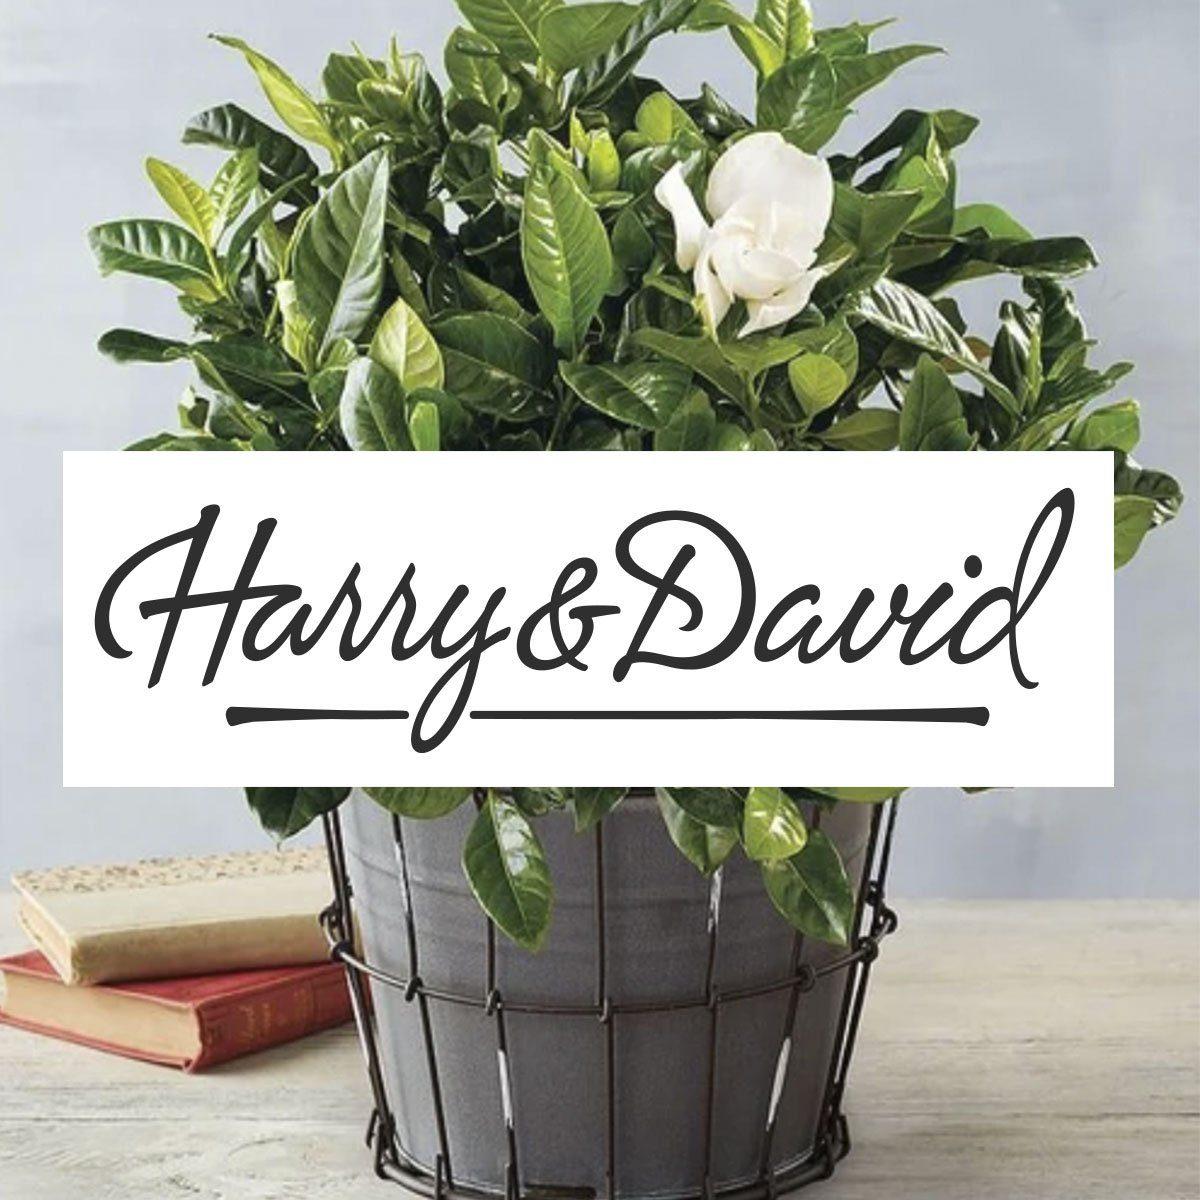 harry and david